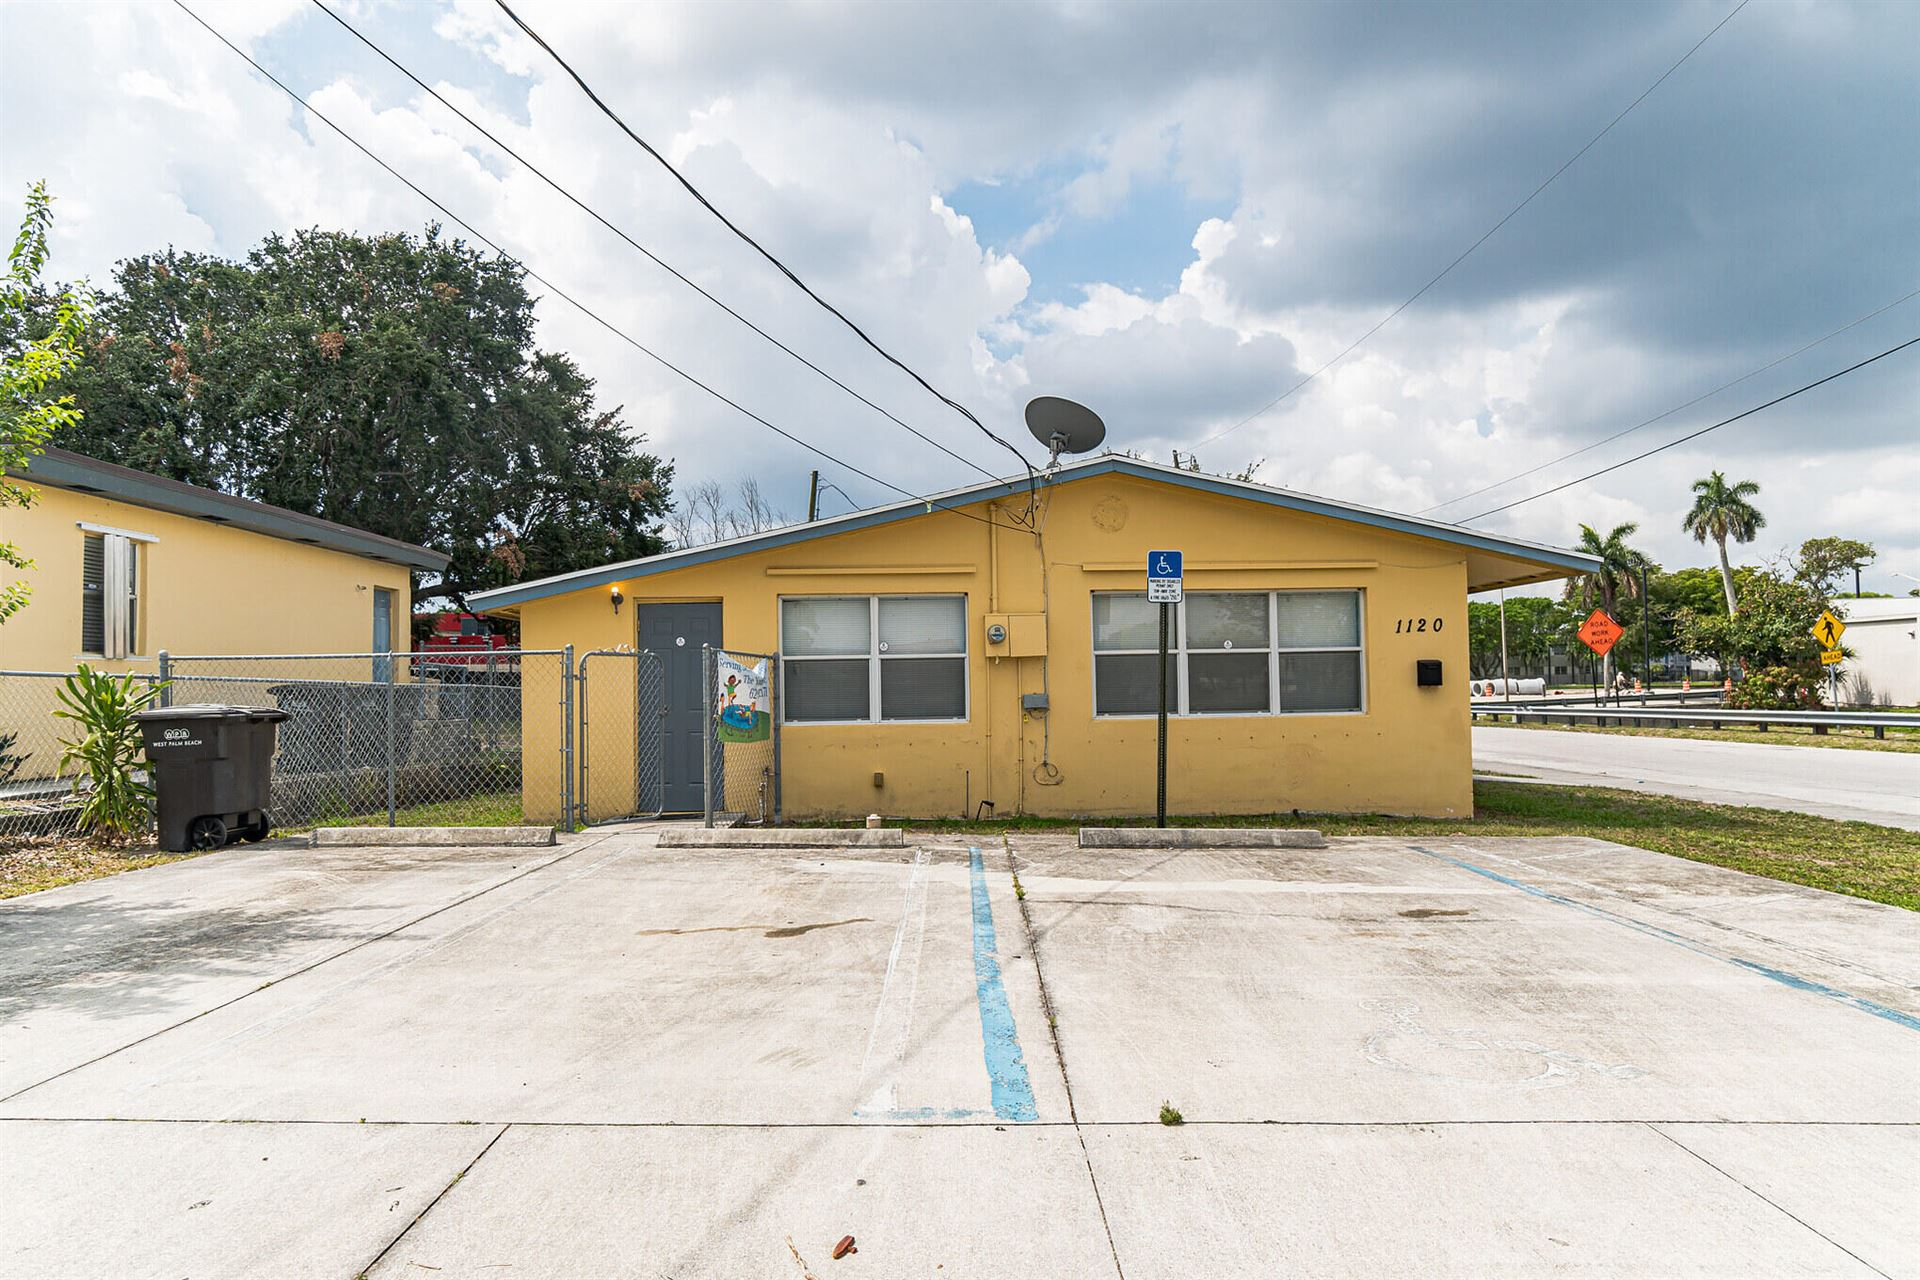 1120 13th Street, West Palm Beach, FL 33401 - MLS#: RX-10712339